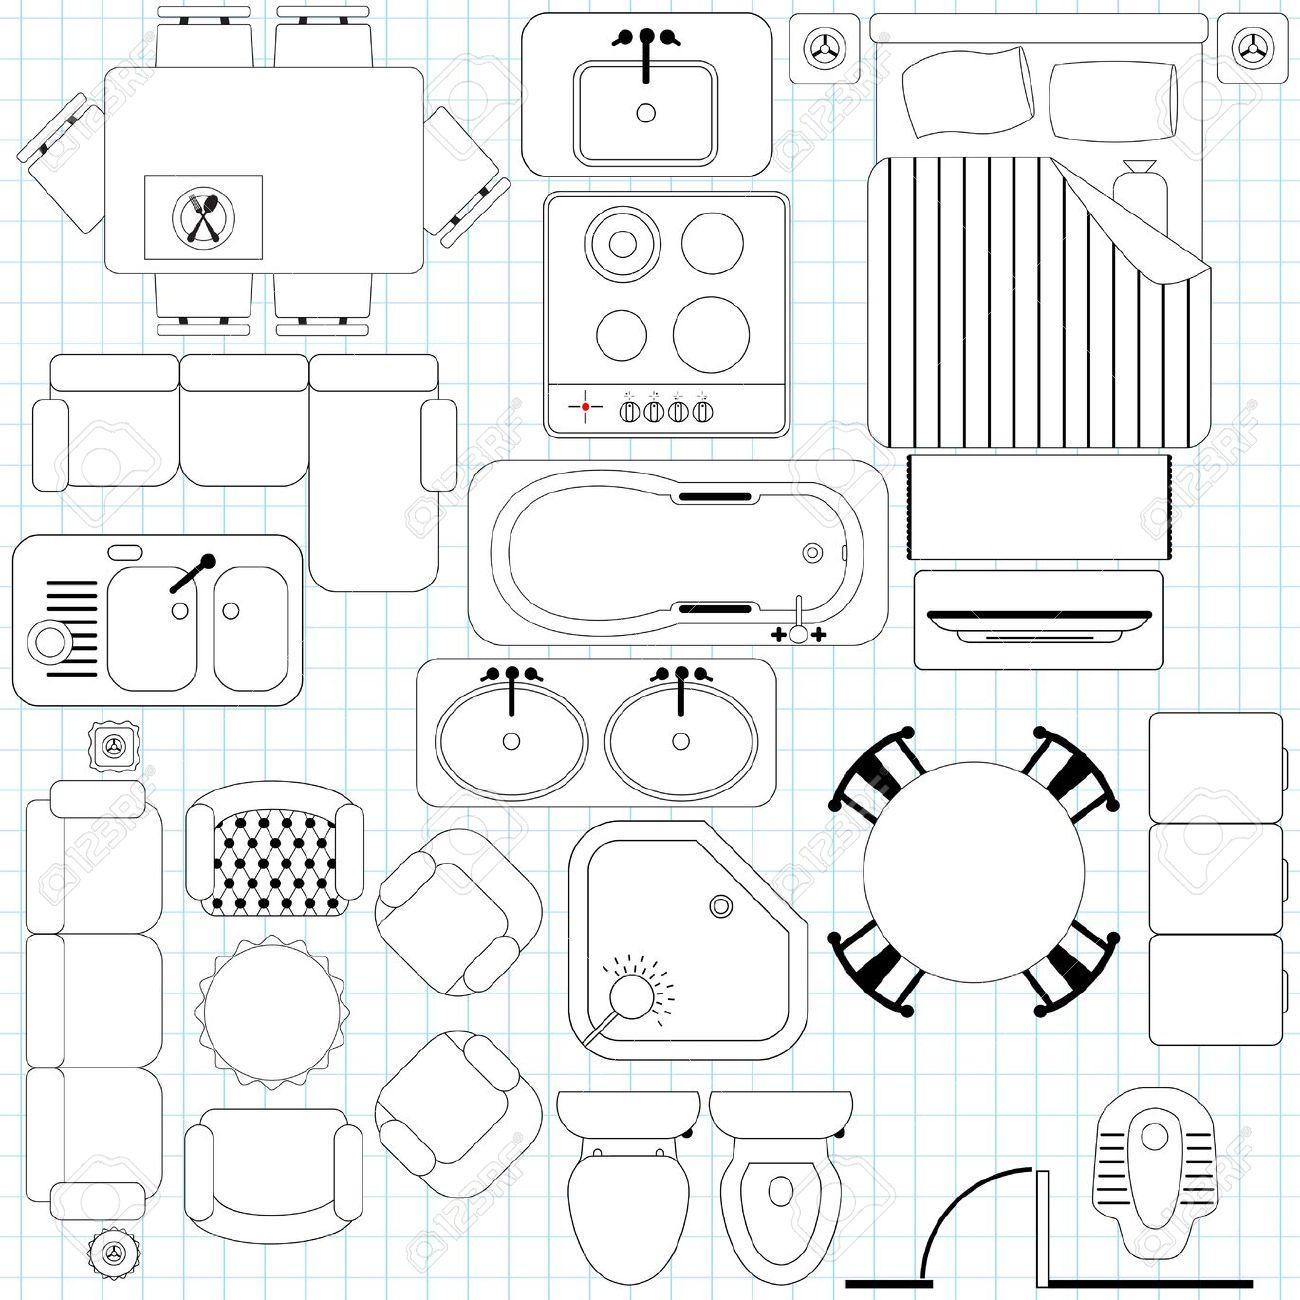 Architectural Drawing Symbols Free